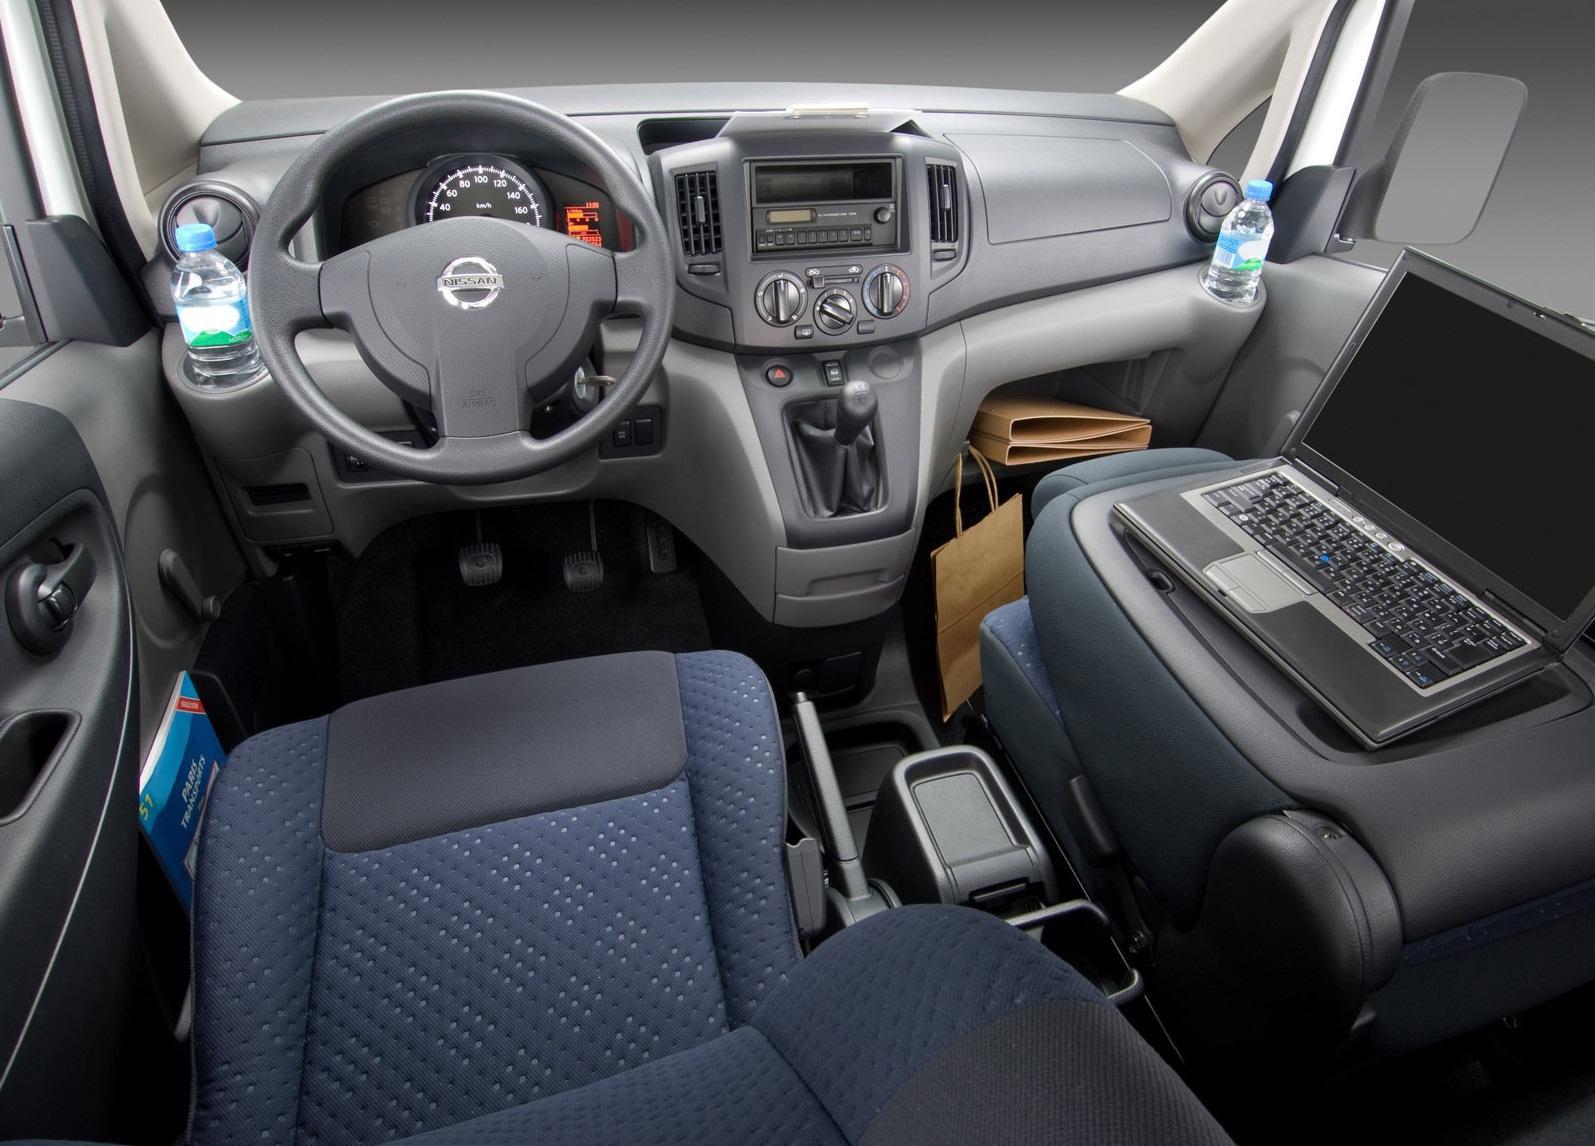 Nissan nv200 van japo ska konkurencja pgd for Nissan nv200 interior